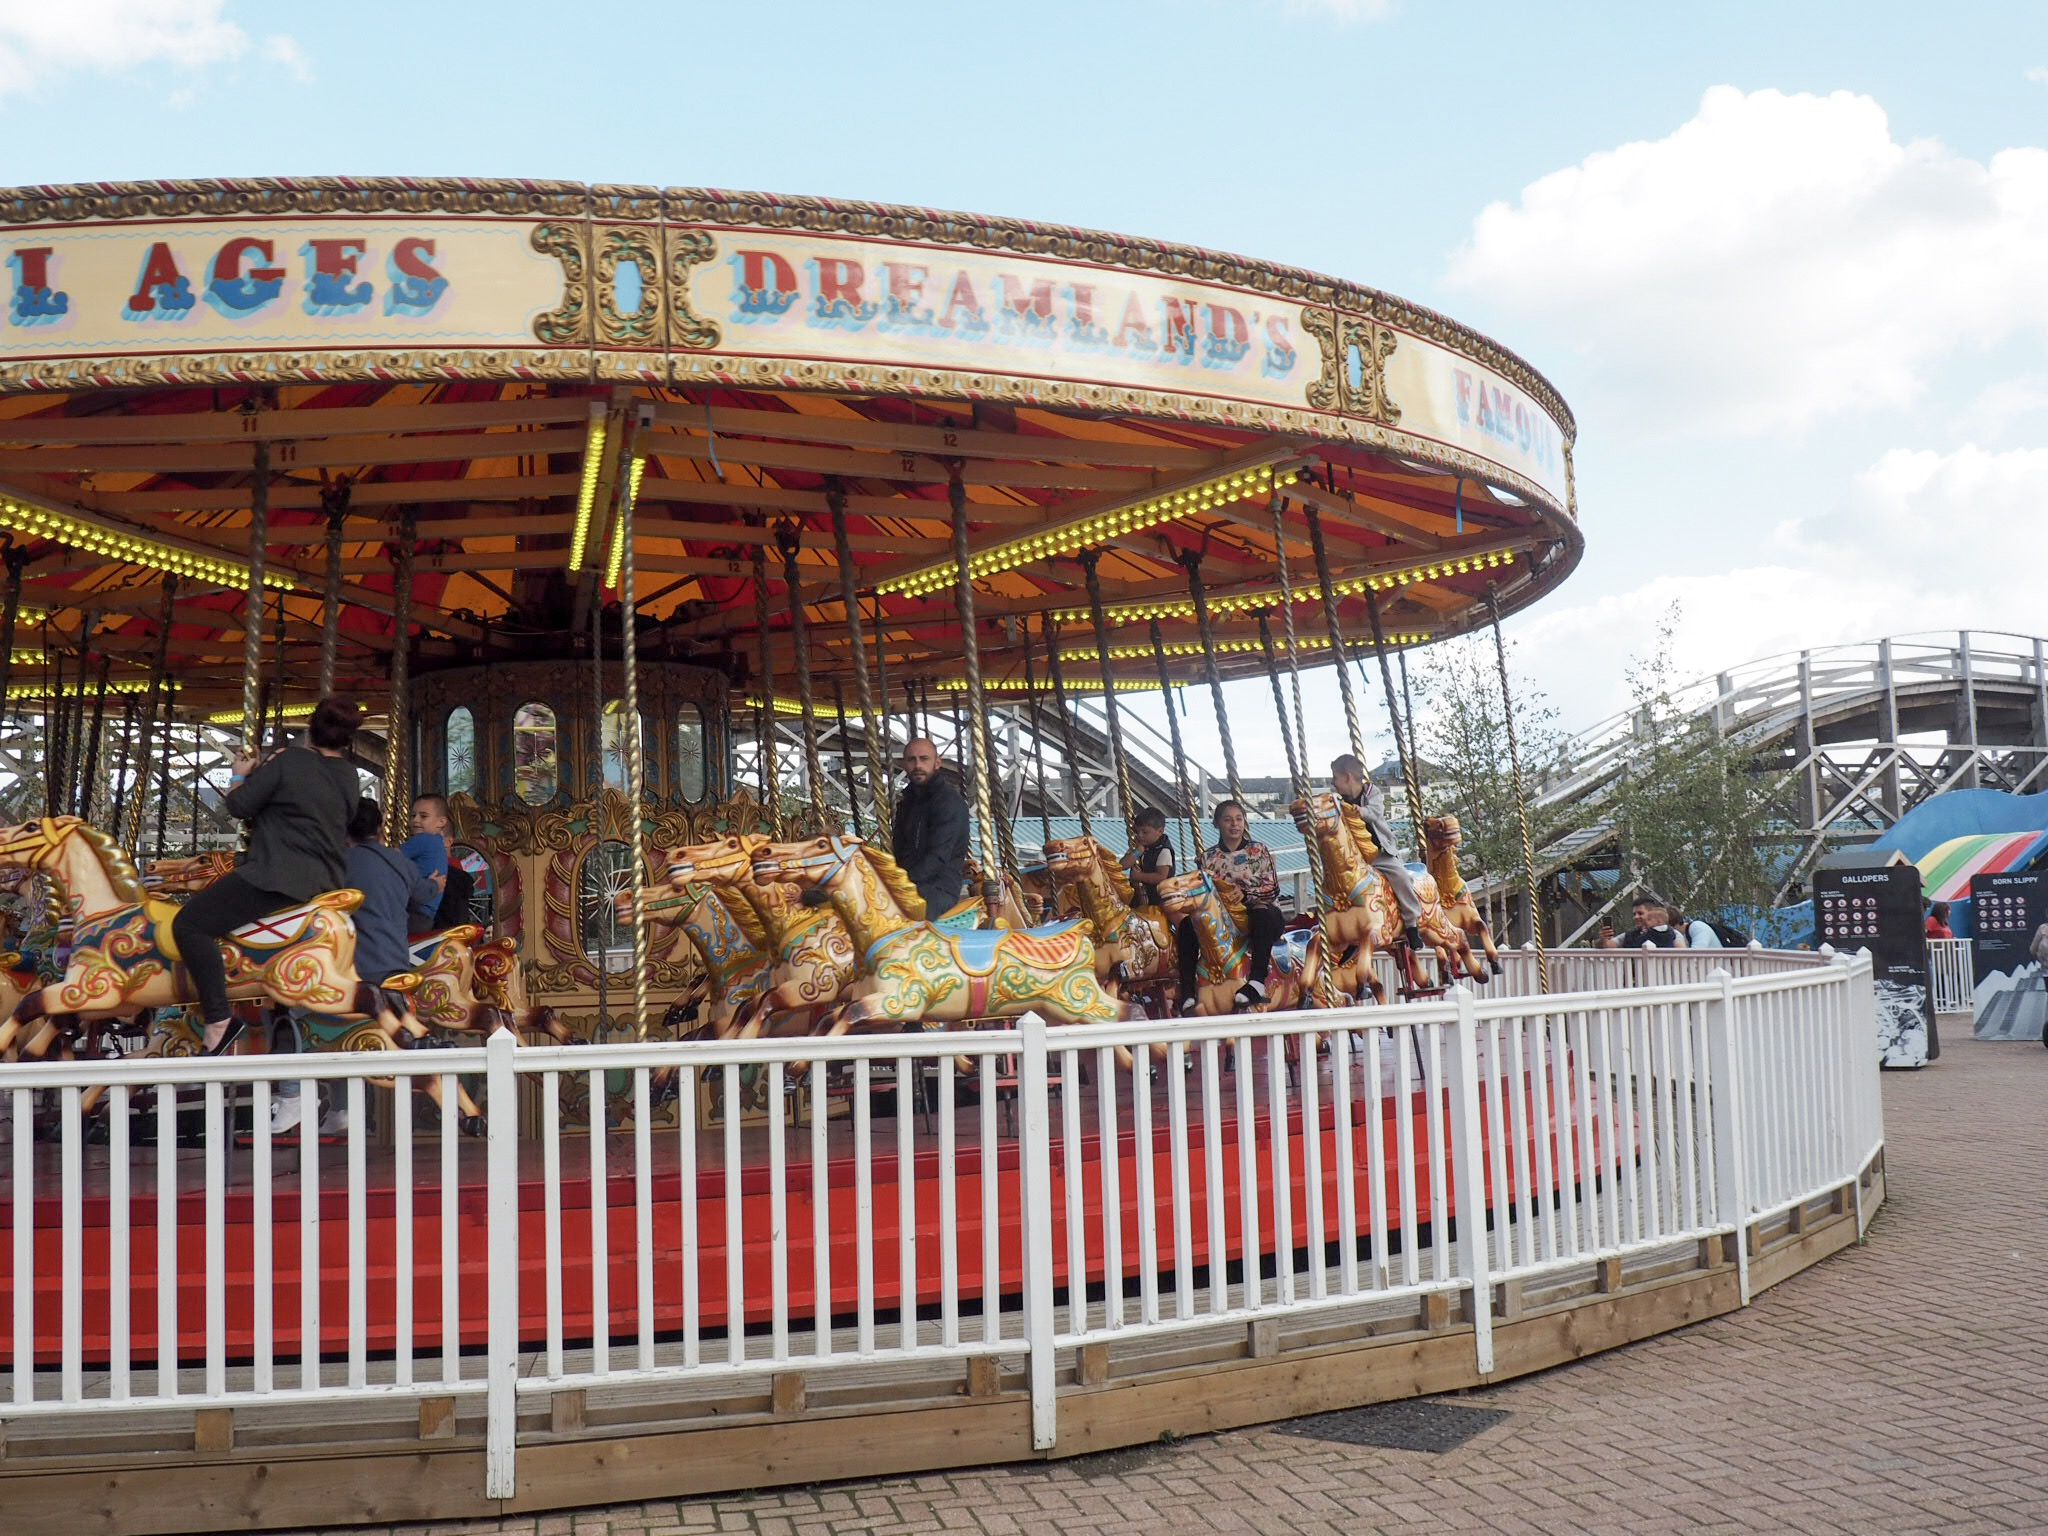 Carousel at Dreamland